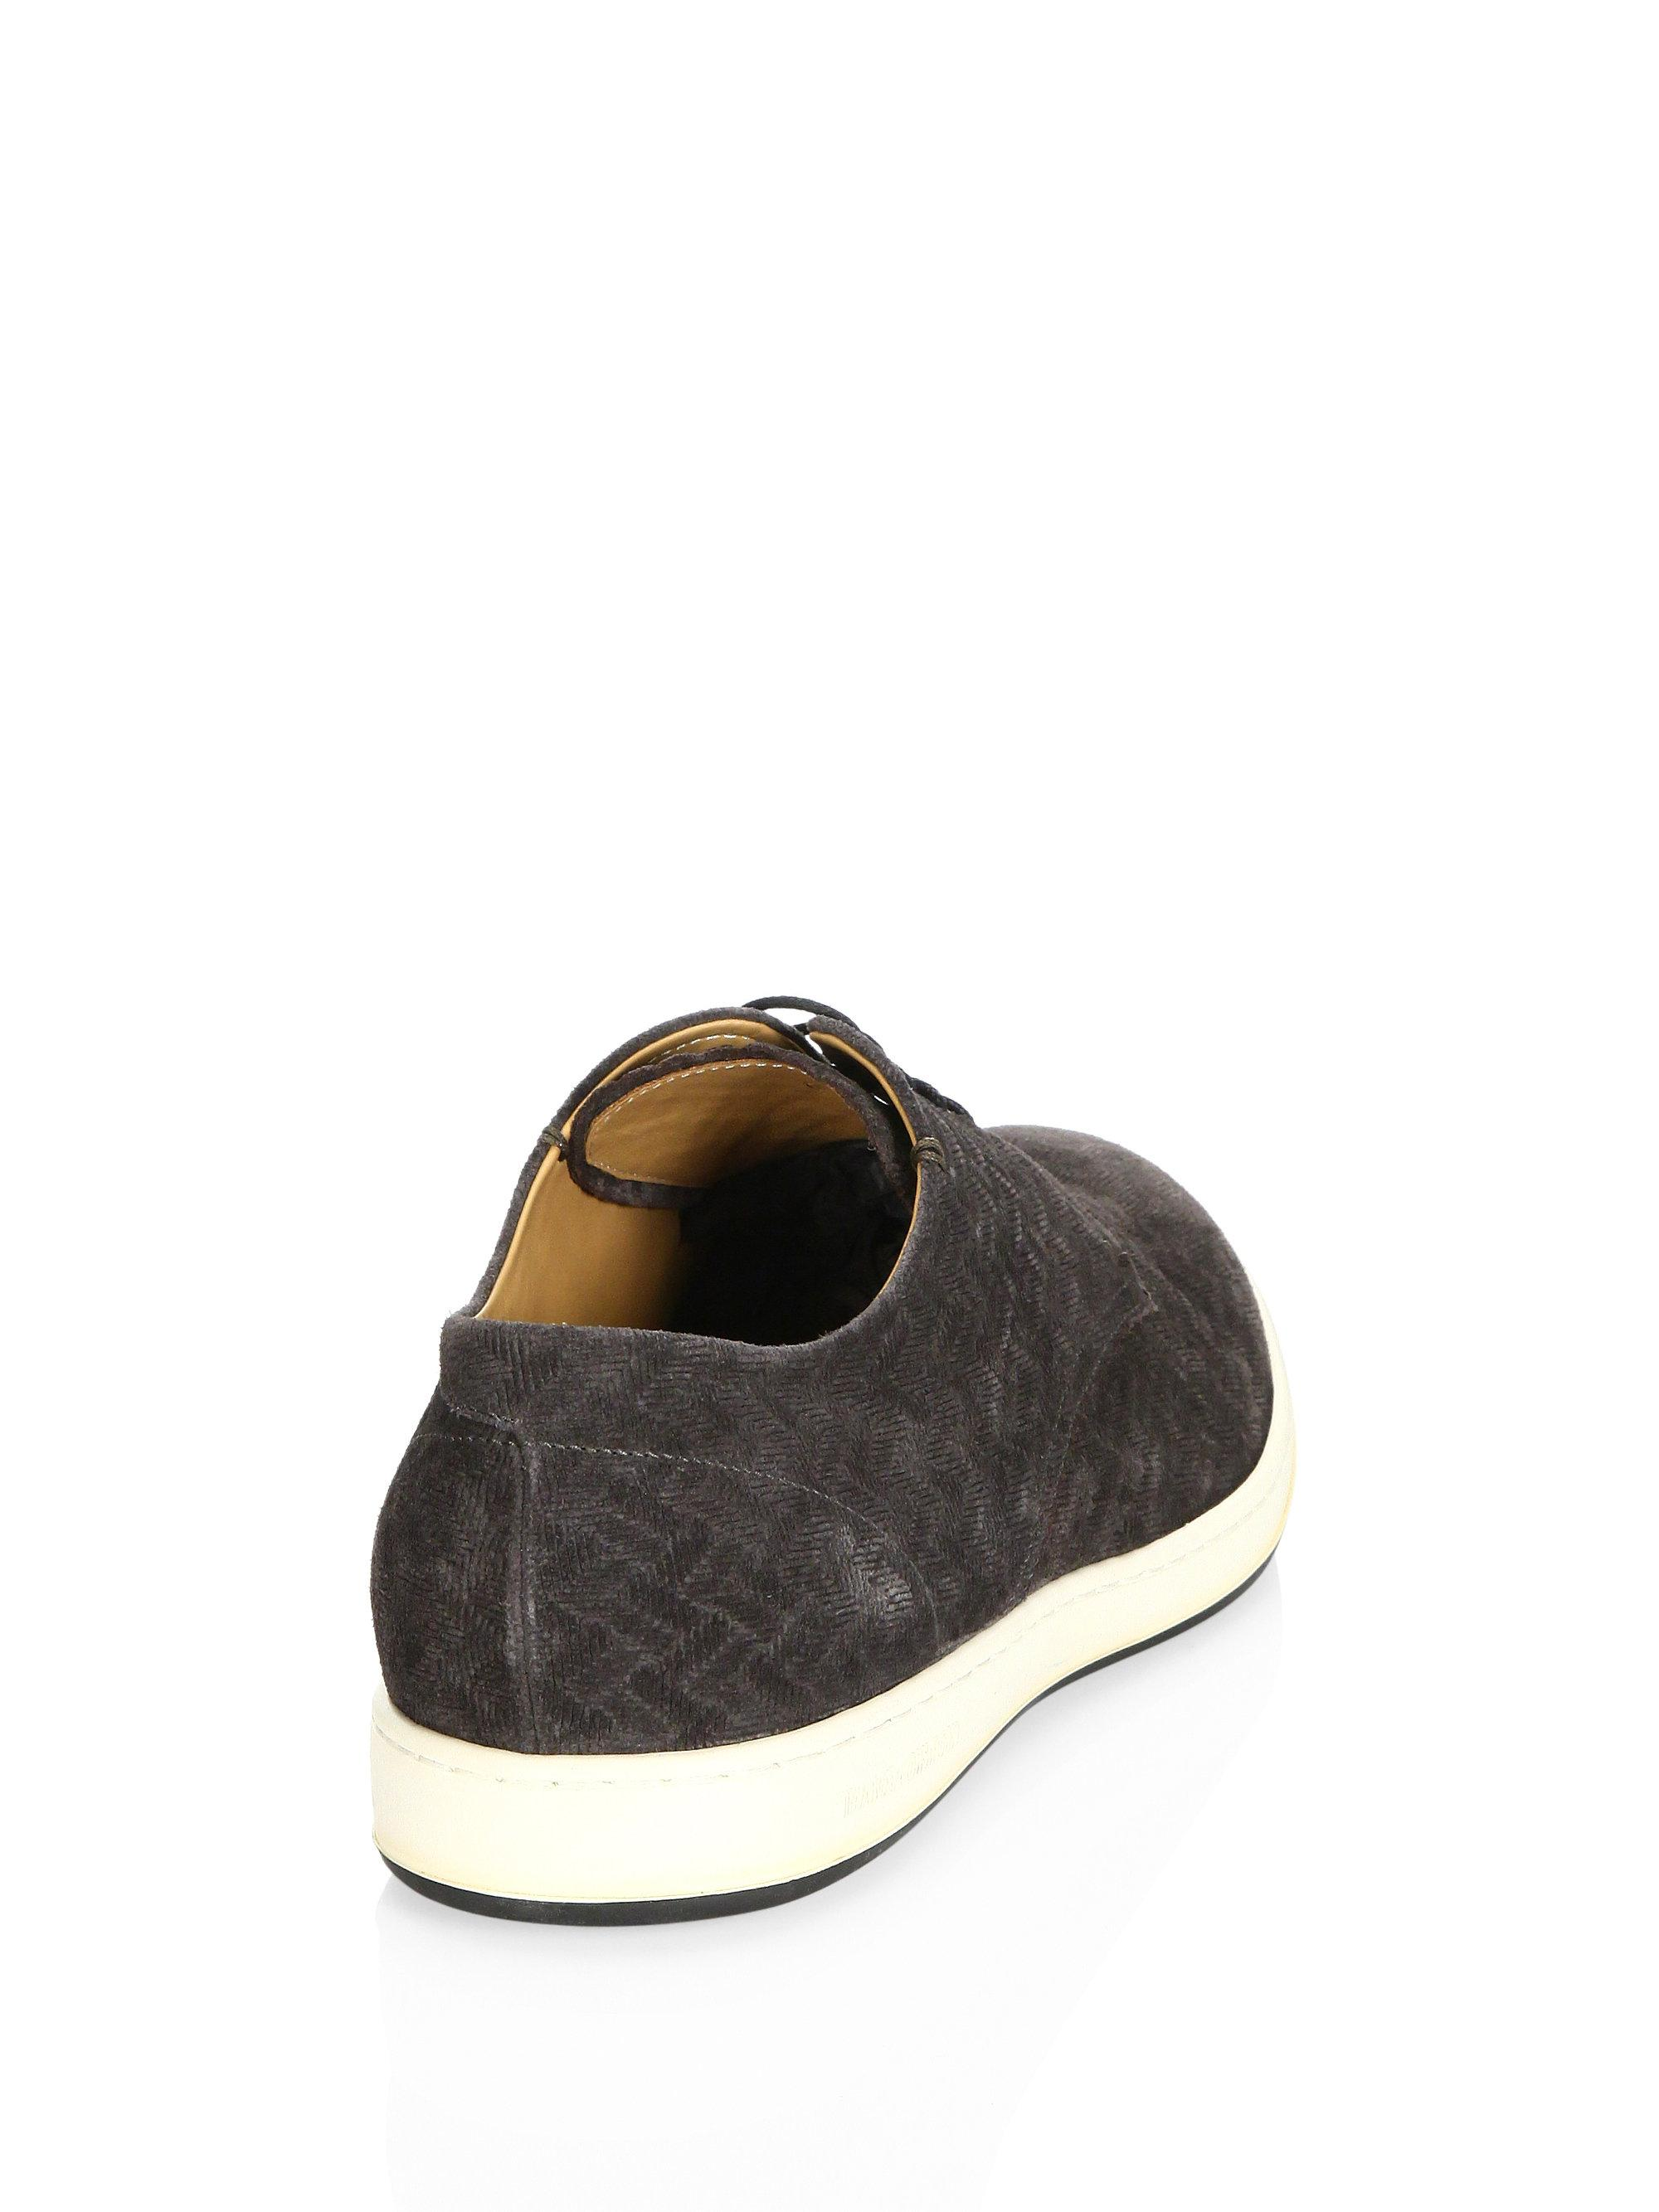 ArmaniClassic Suede Sneakers xUa5OO